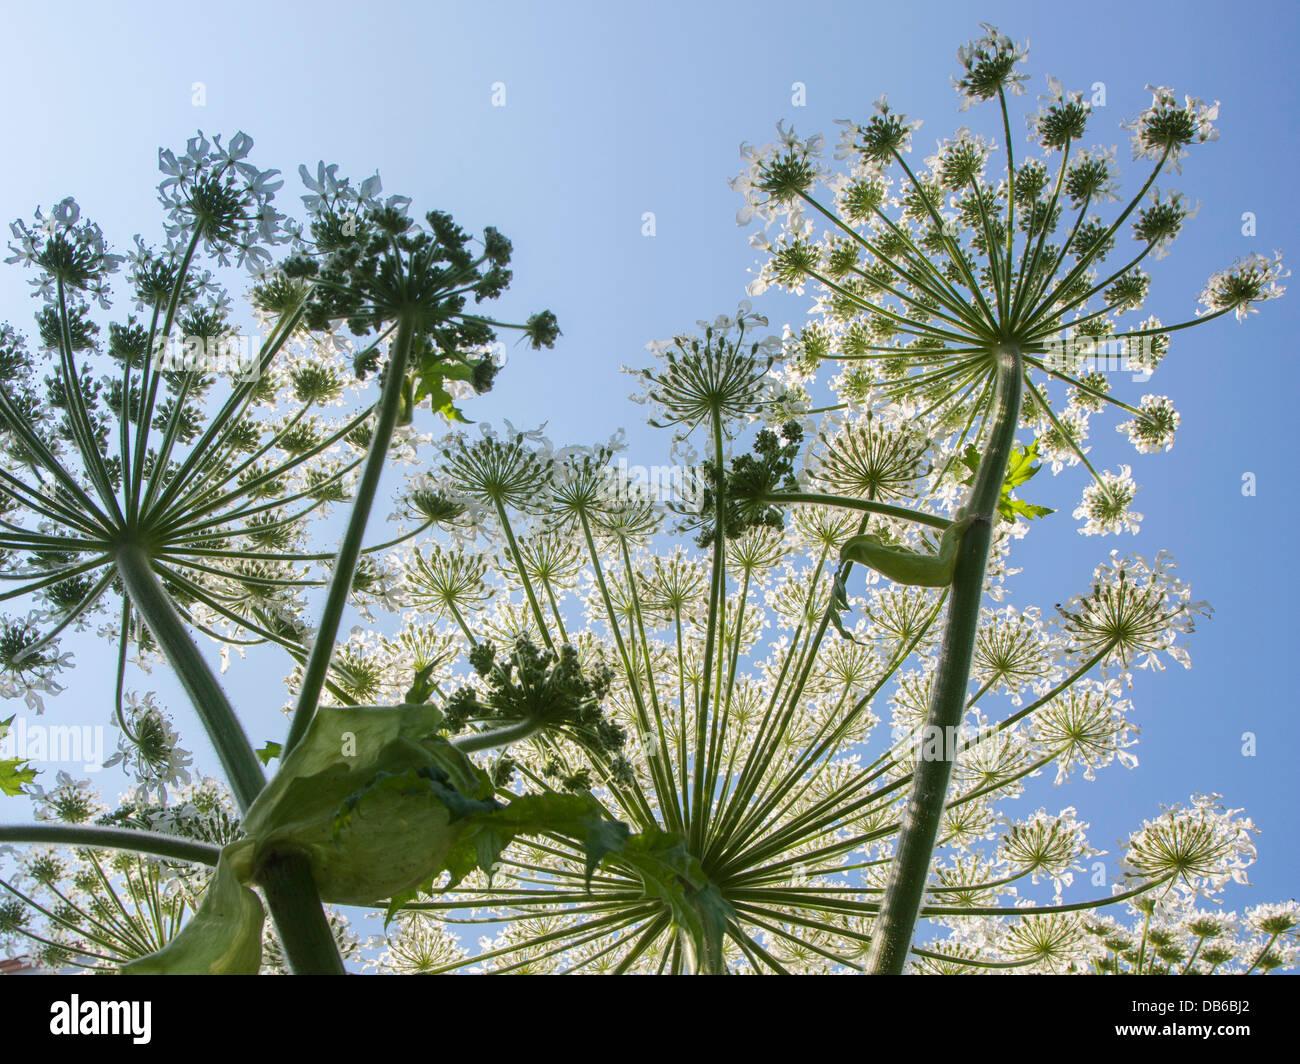 Worm's-eye view of Giant hogweed / cartwheel-flower (Heracleum mantegazzianum) close up against blue sky Stock Photo